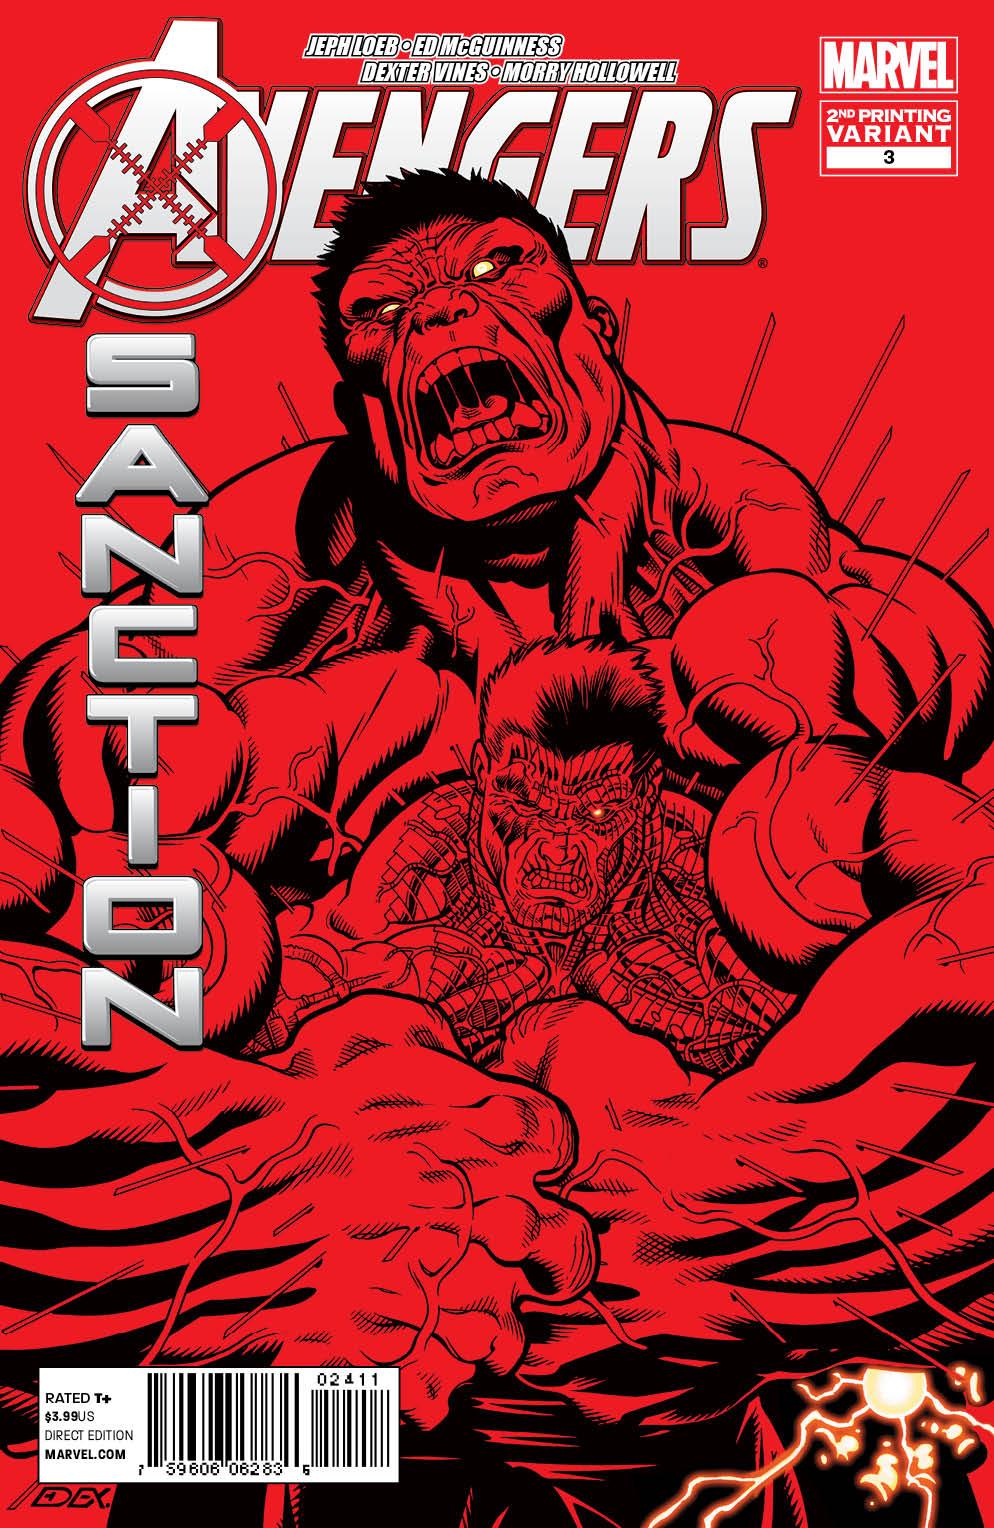 AvengersXSanction_3_SecondPrint AVENGERS: X-SANCTION #3 sells out and gets second printing